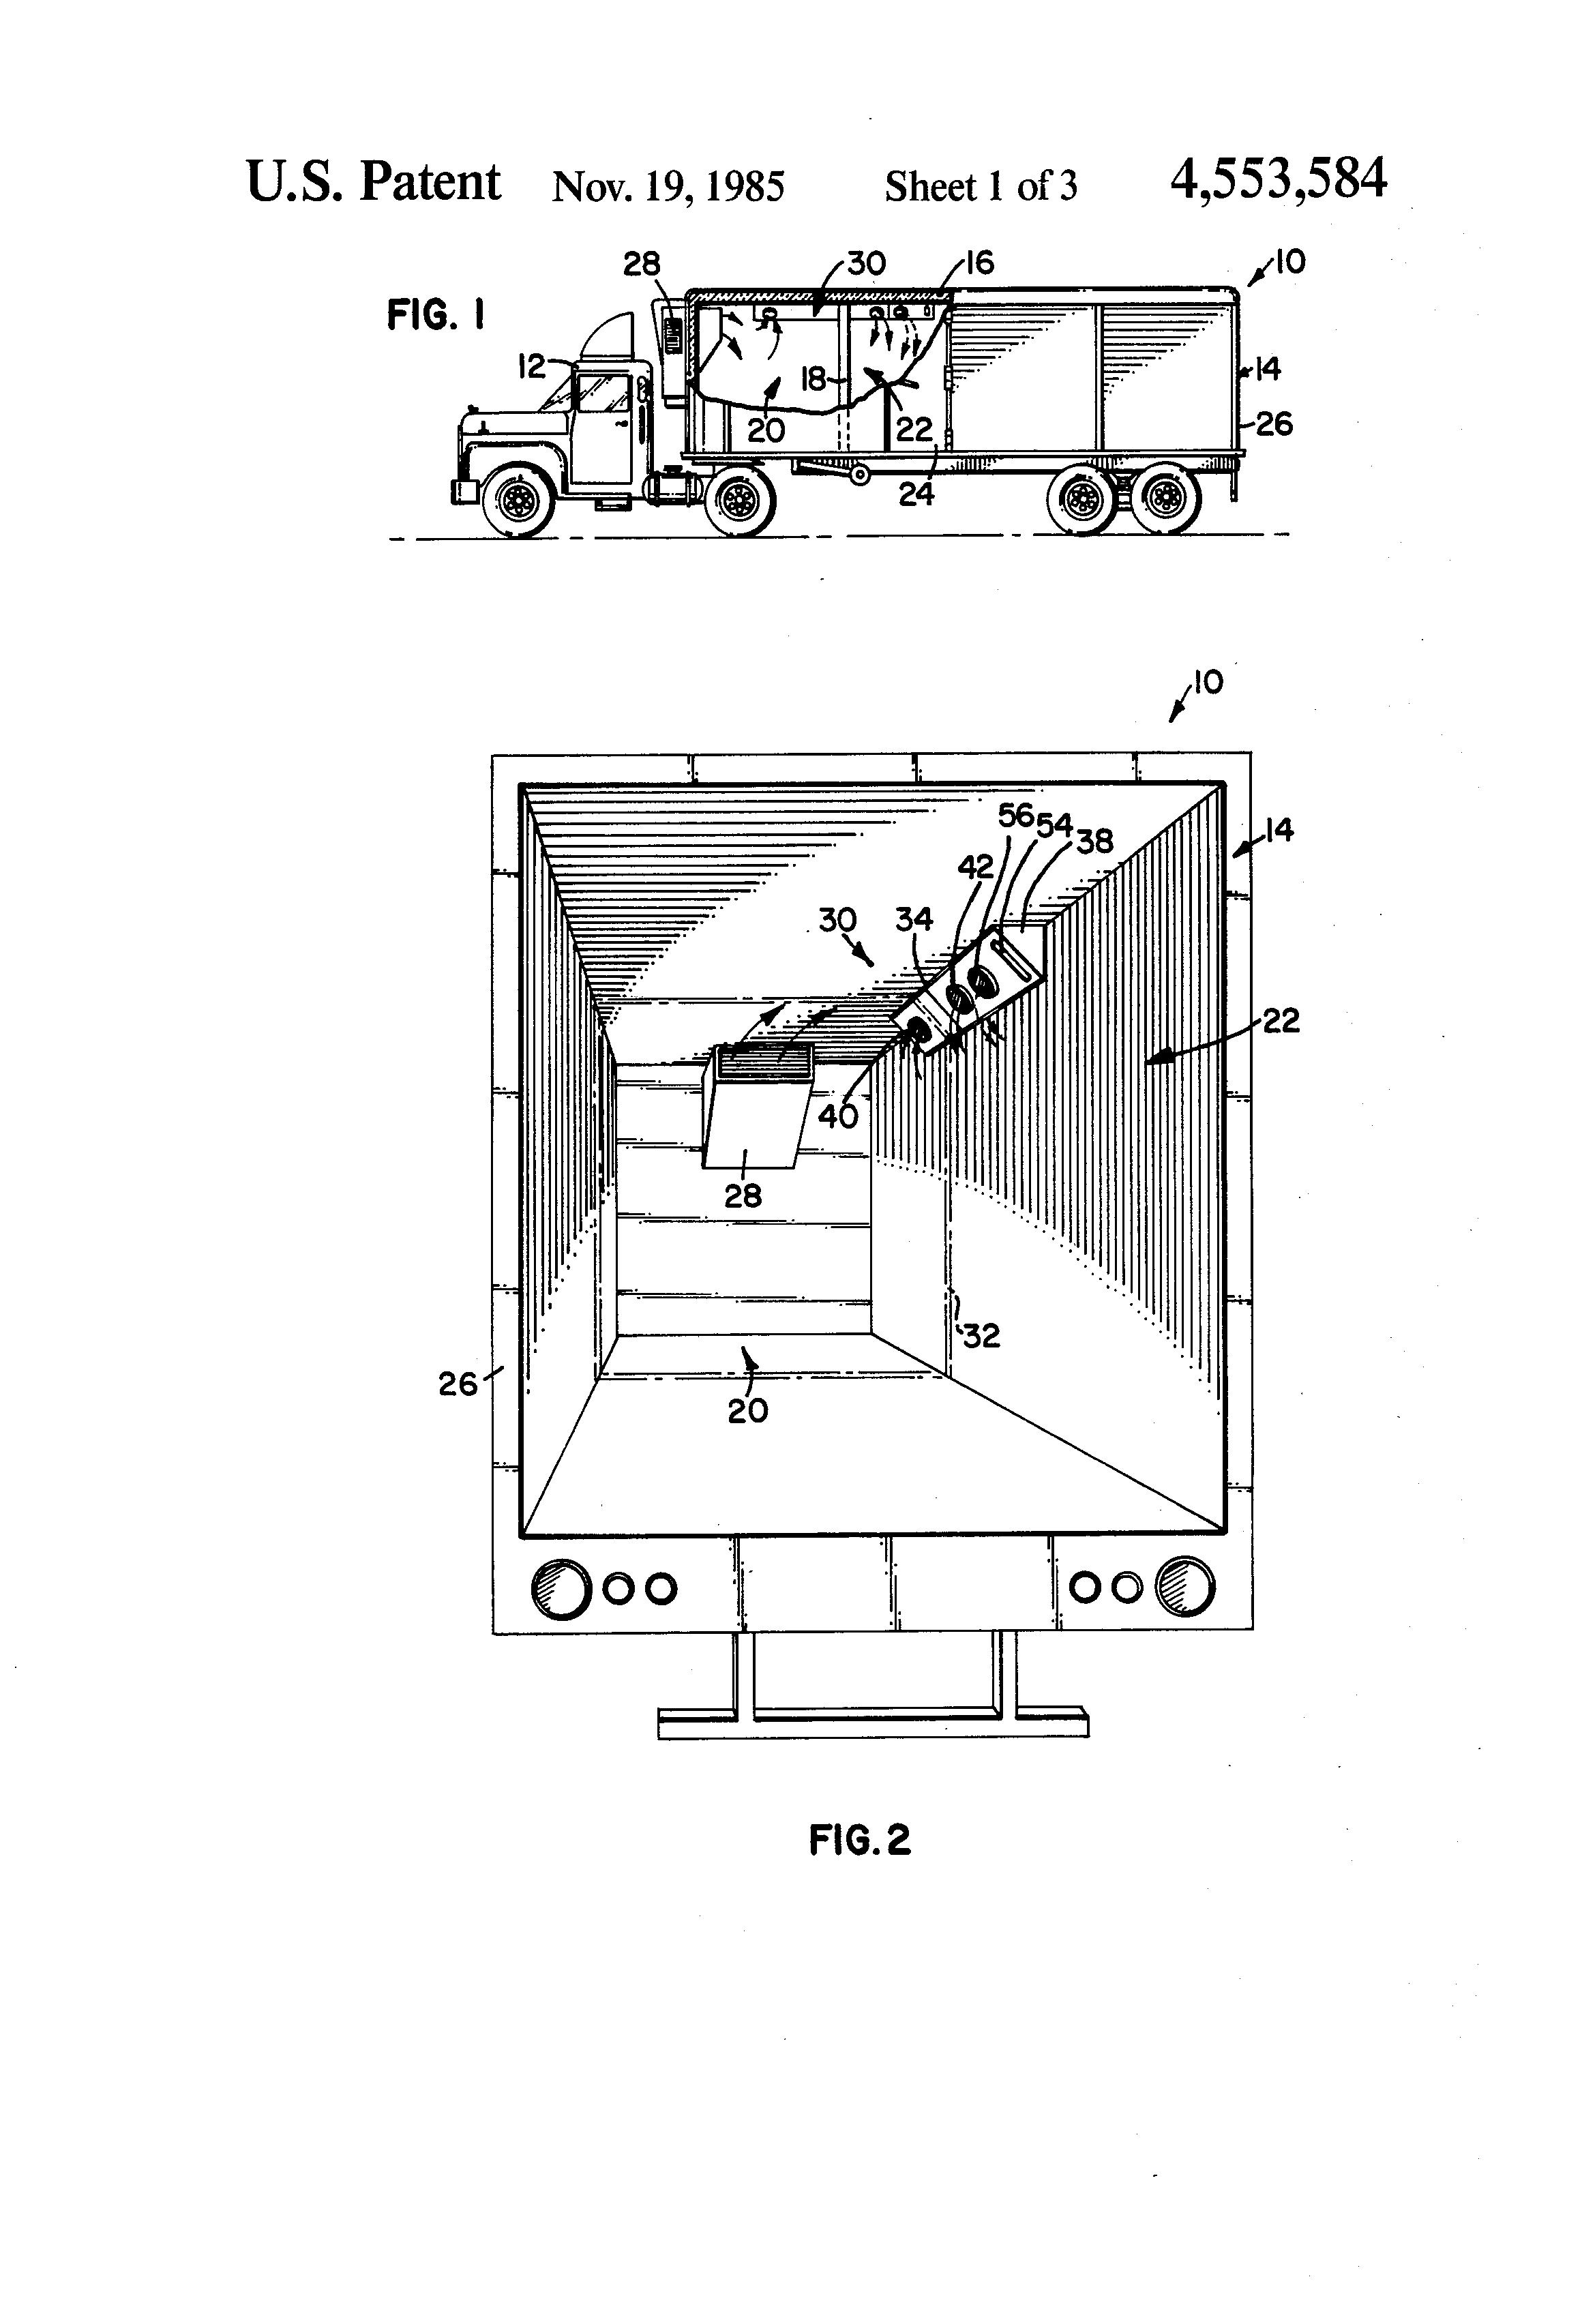 1991 international truck wiring diagram refrigerated truck wiring diagram kramer vanguard wiring ... refrigerated truck wiring diagram #10